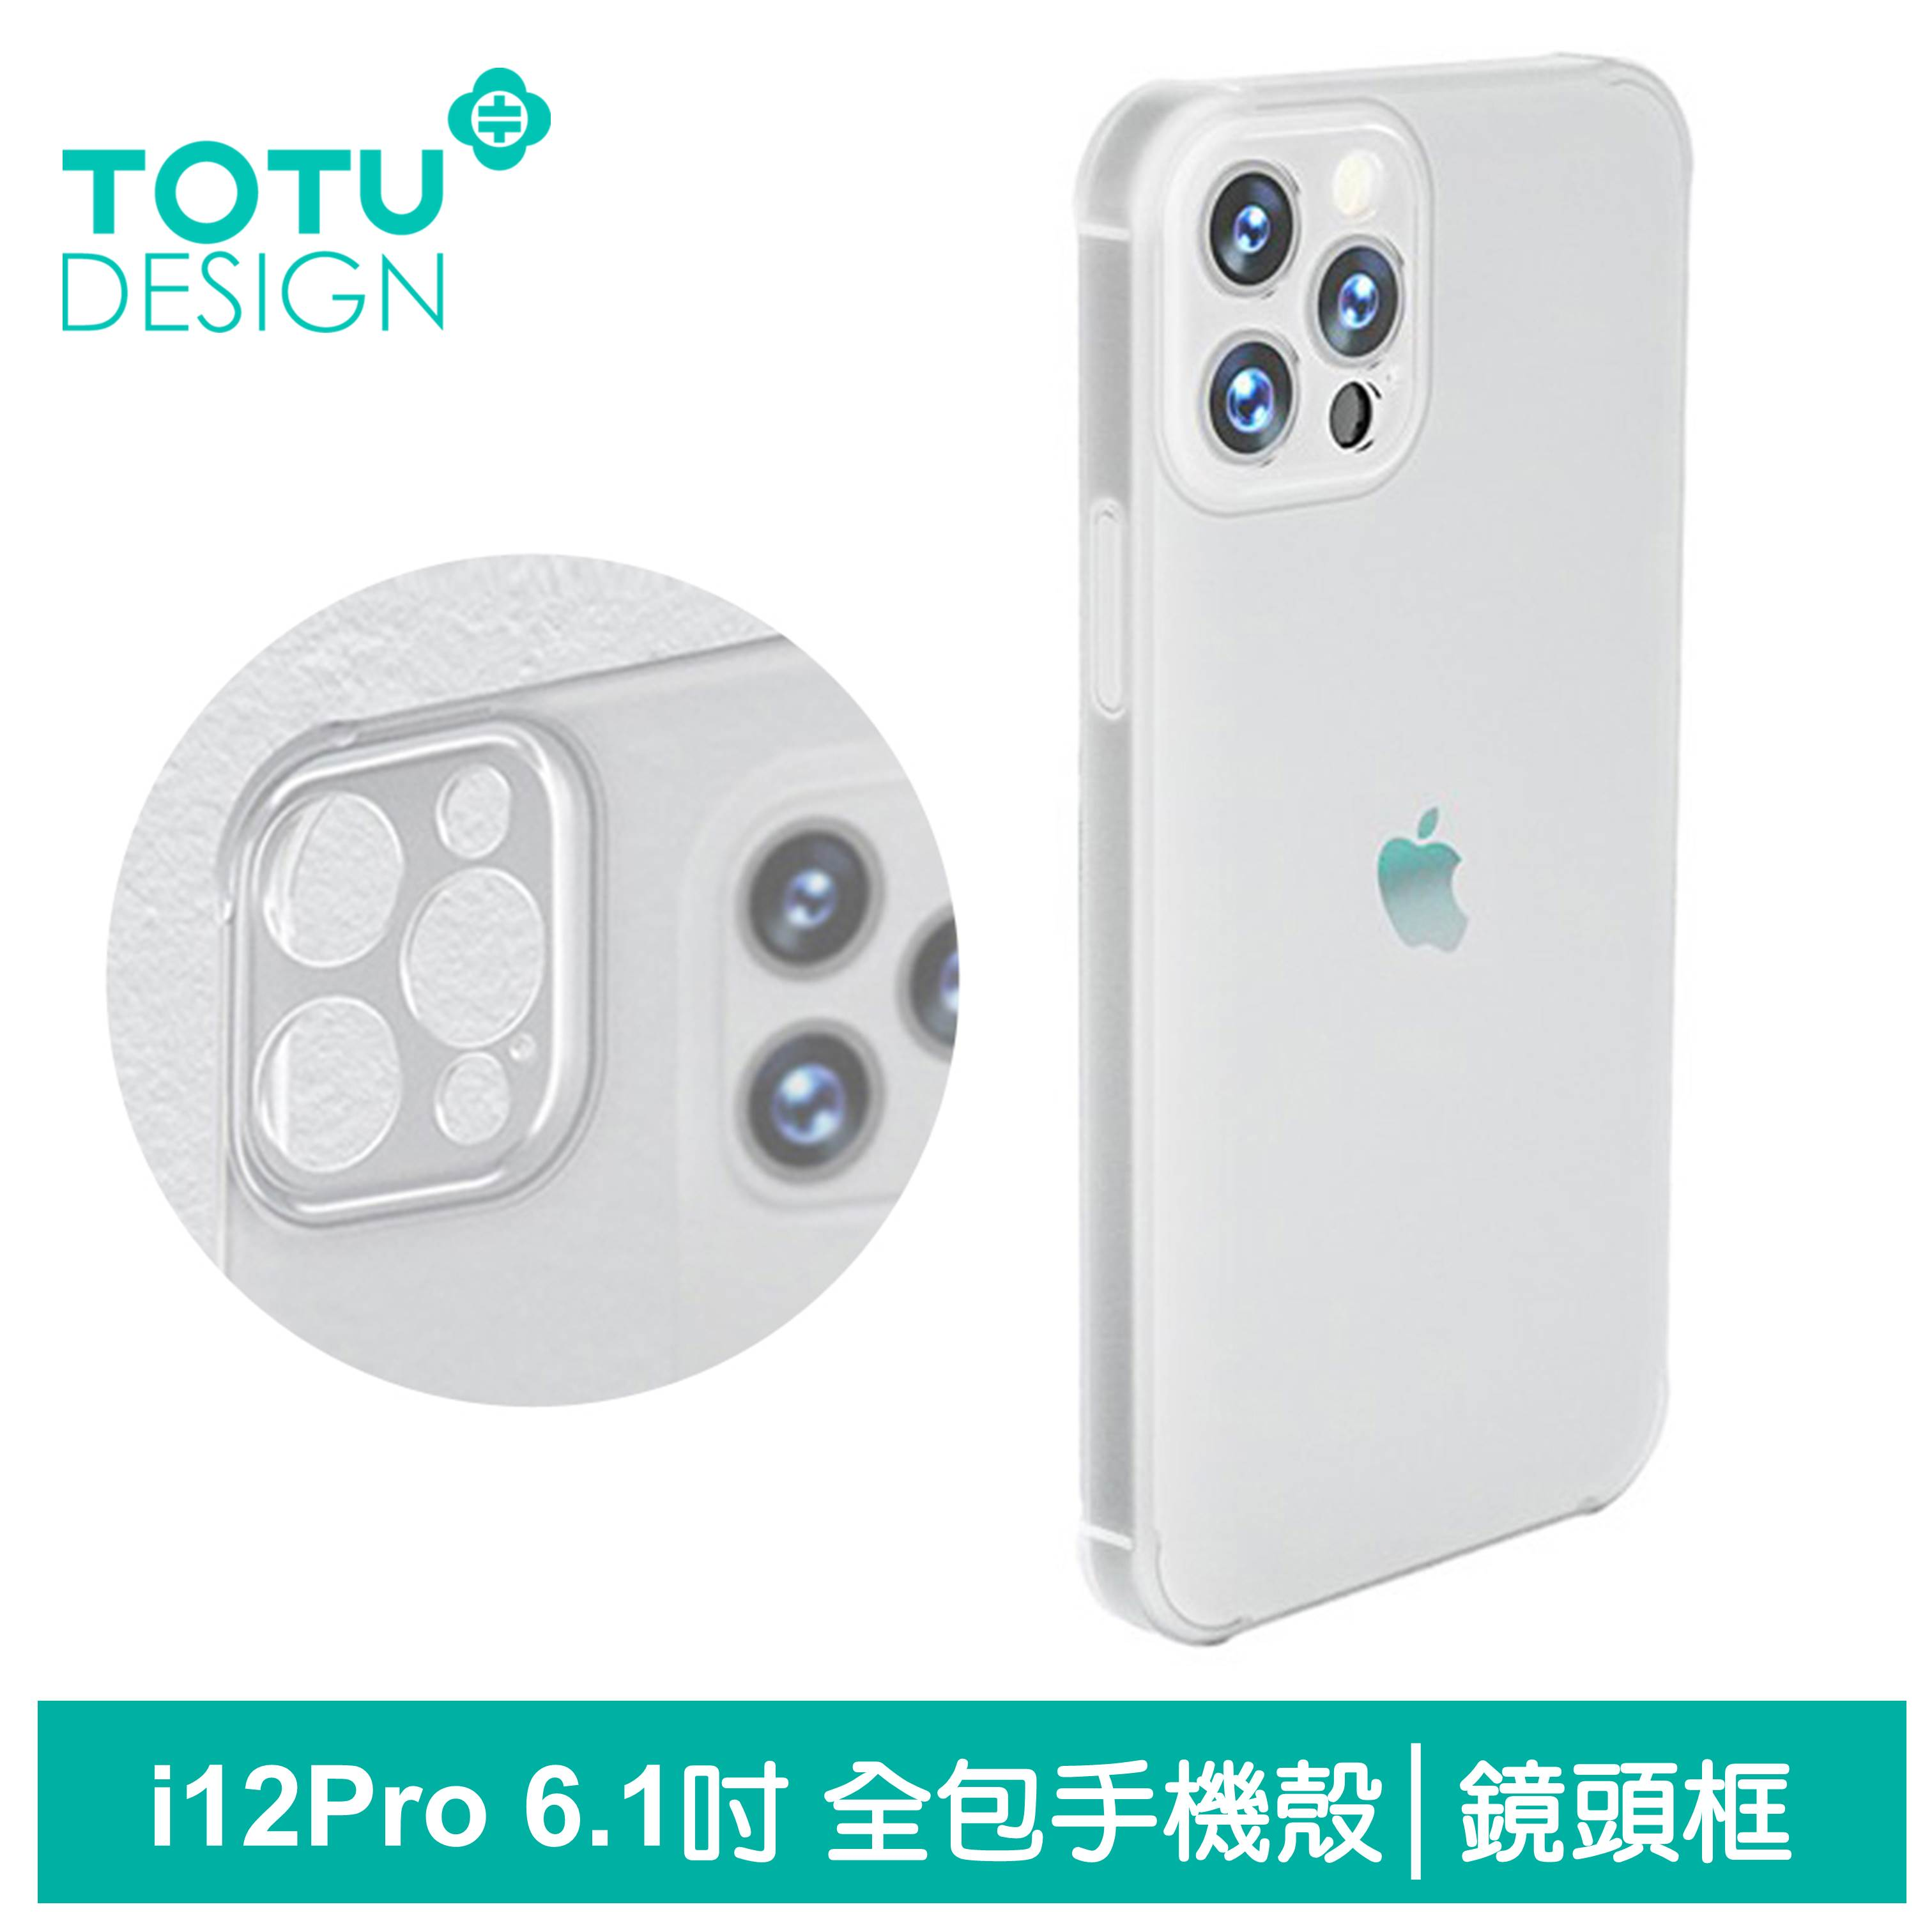 TOTU台灣官方 iPhone 12 Pro 6.1吋 手機殼防摔殼保護殼鏡頭框全包硬殼 零感系列 透白